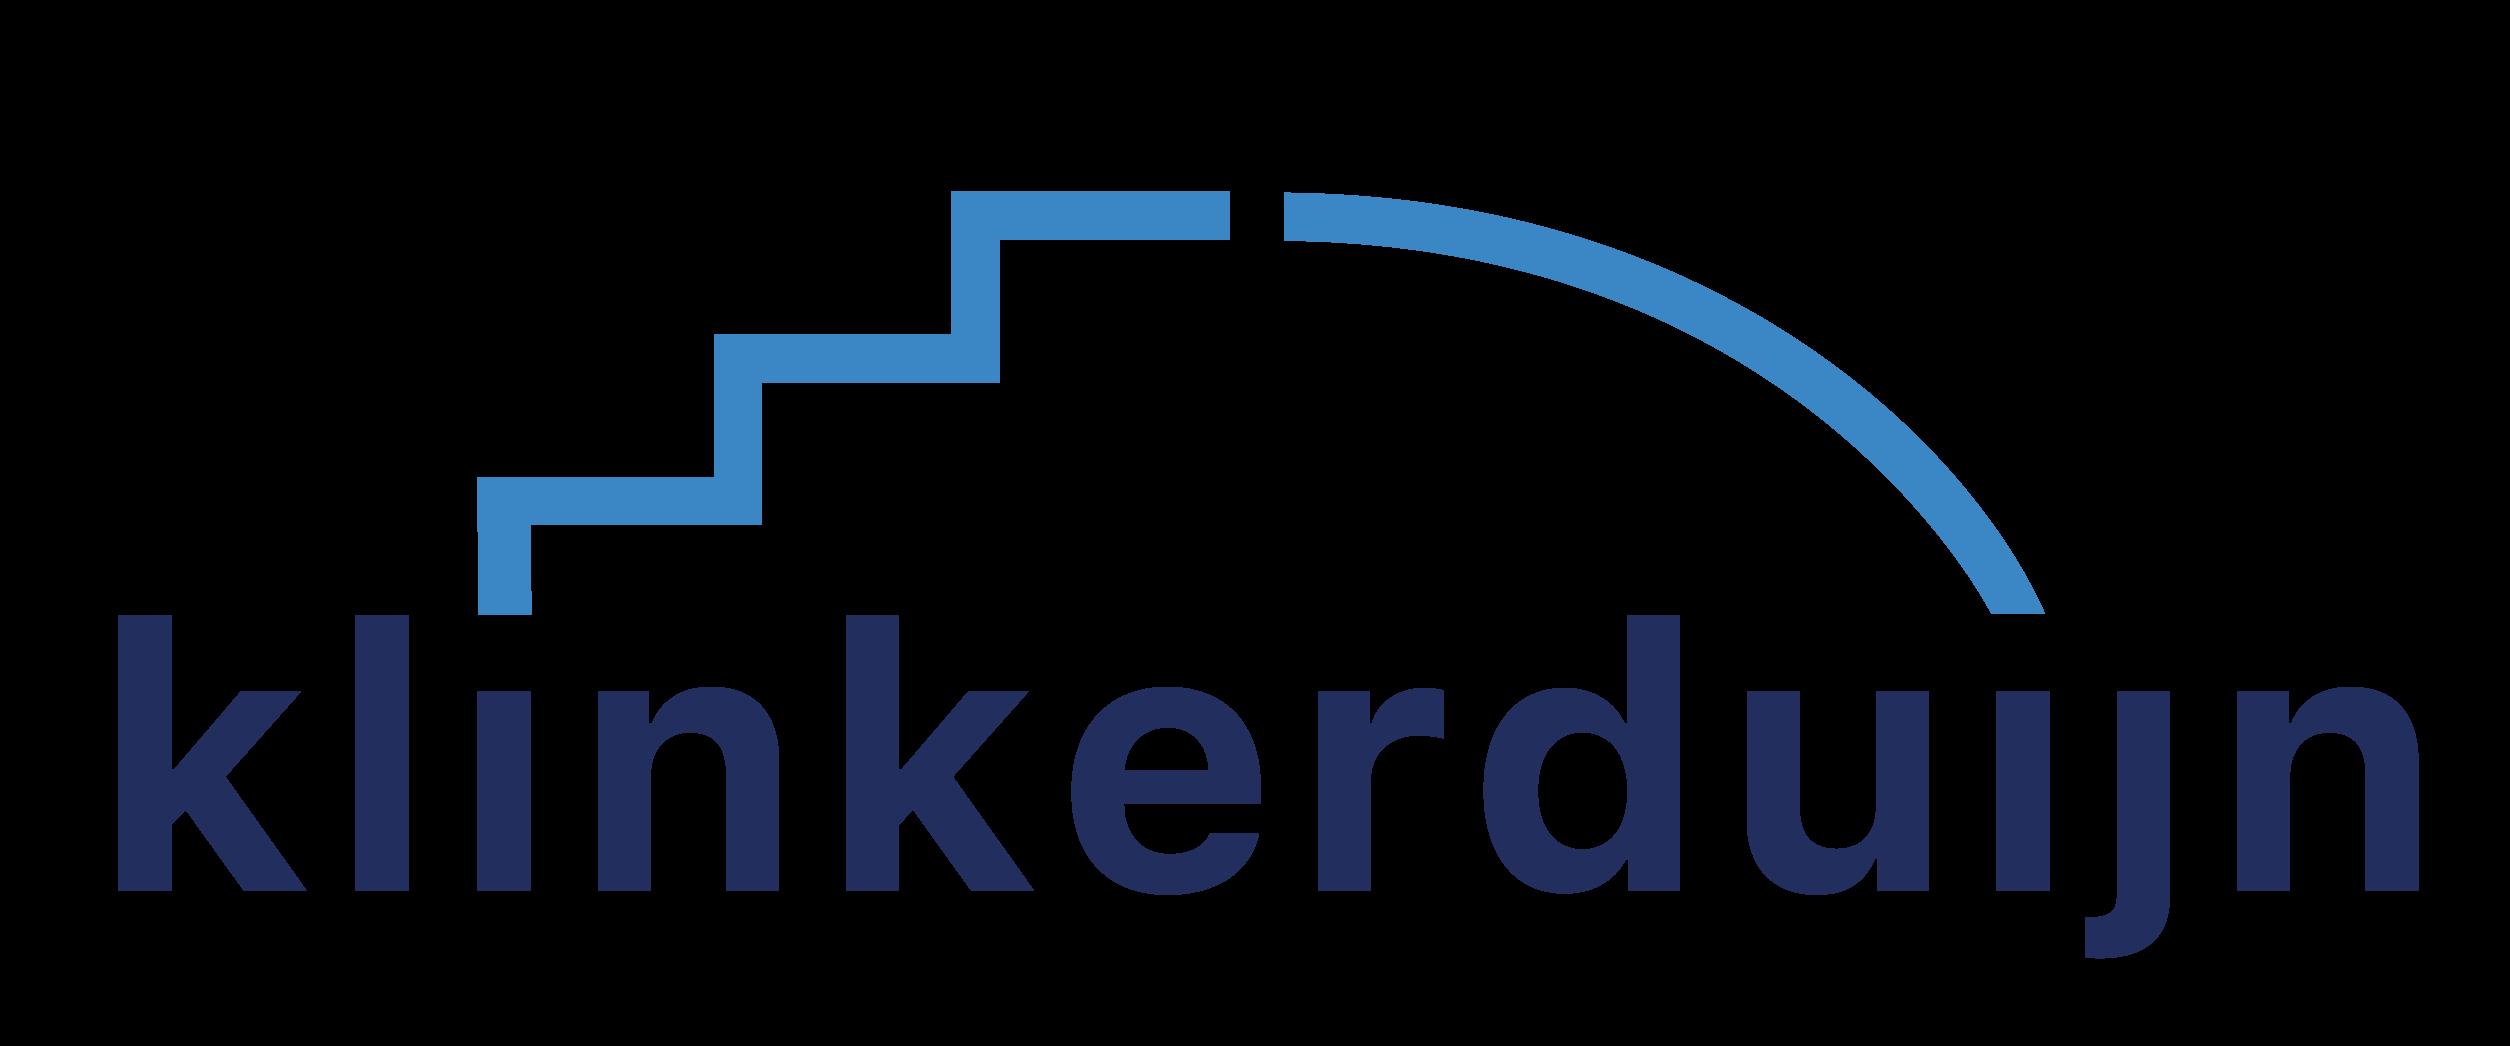 logo-Klinkerduijn_2.0-03